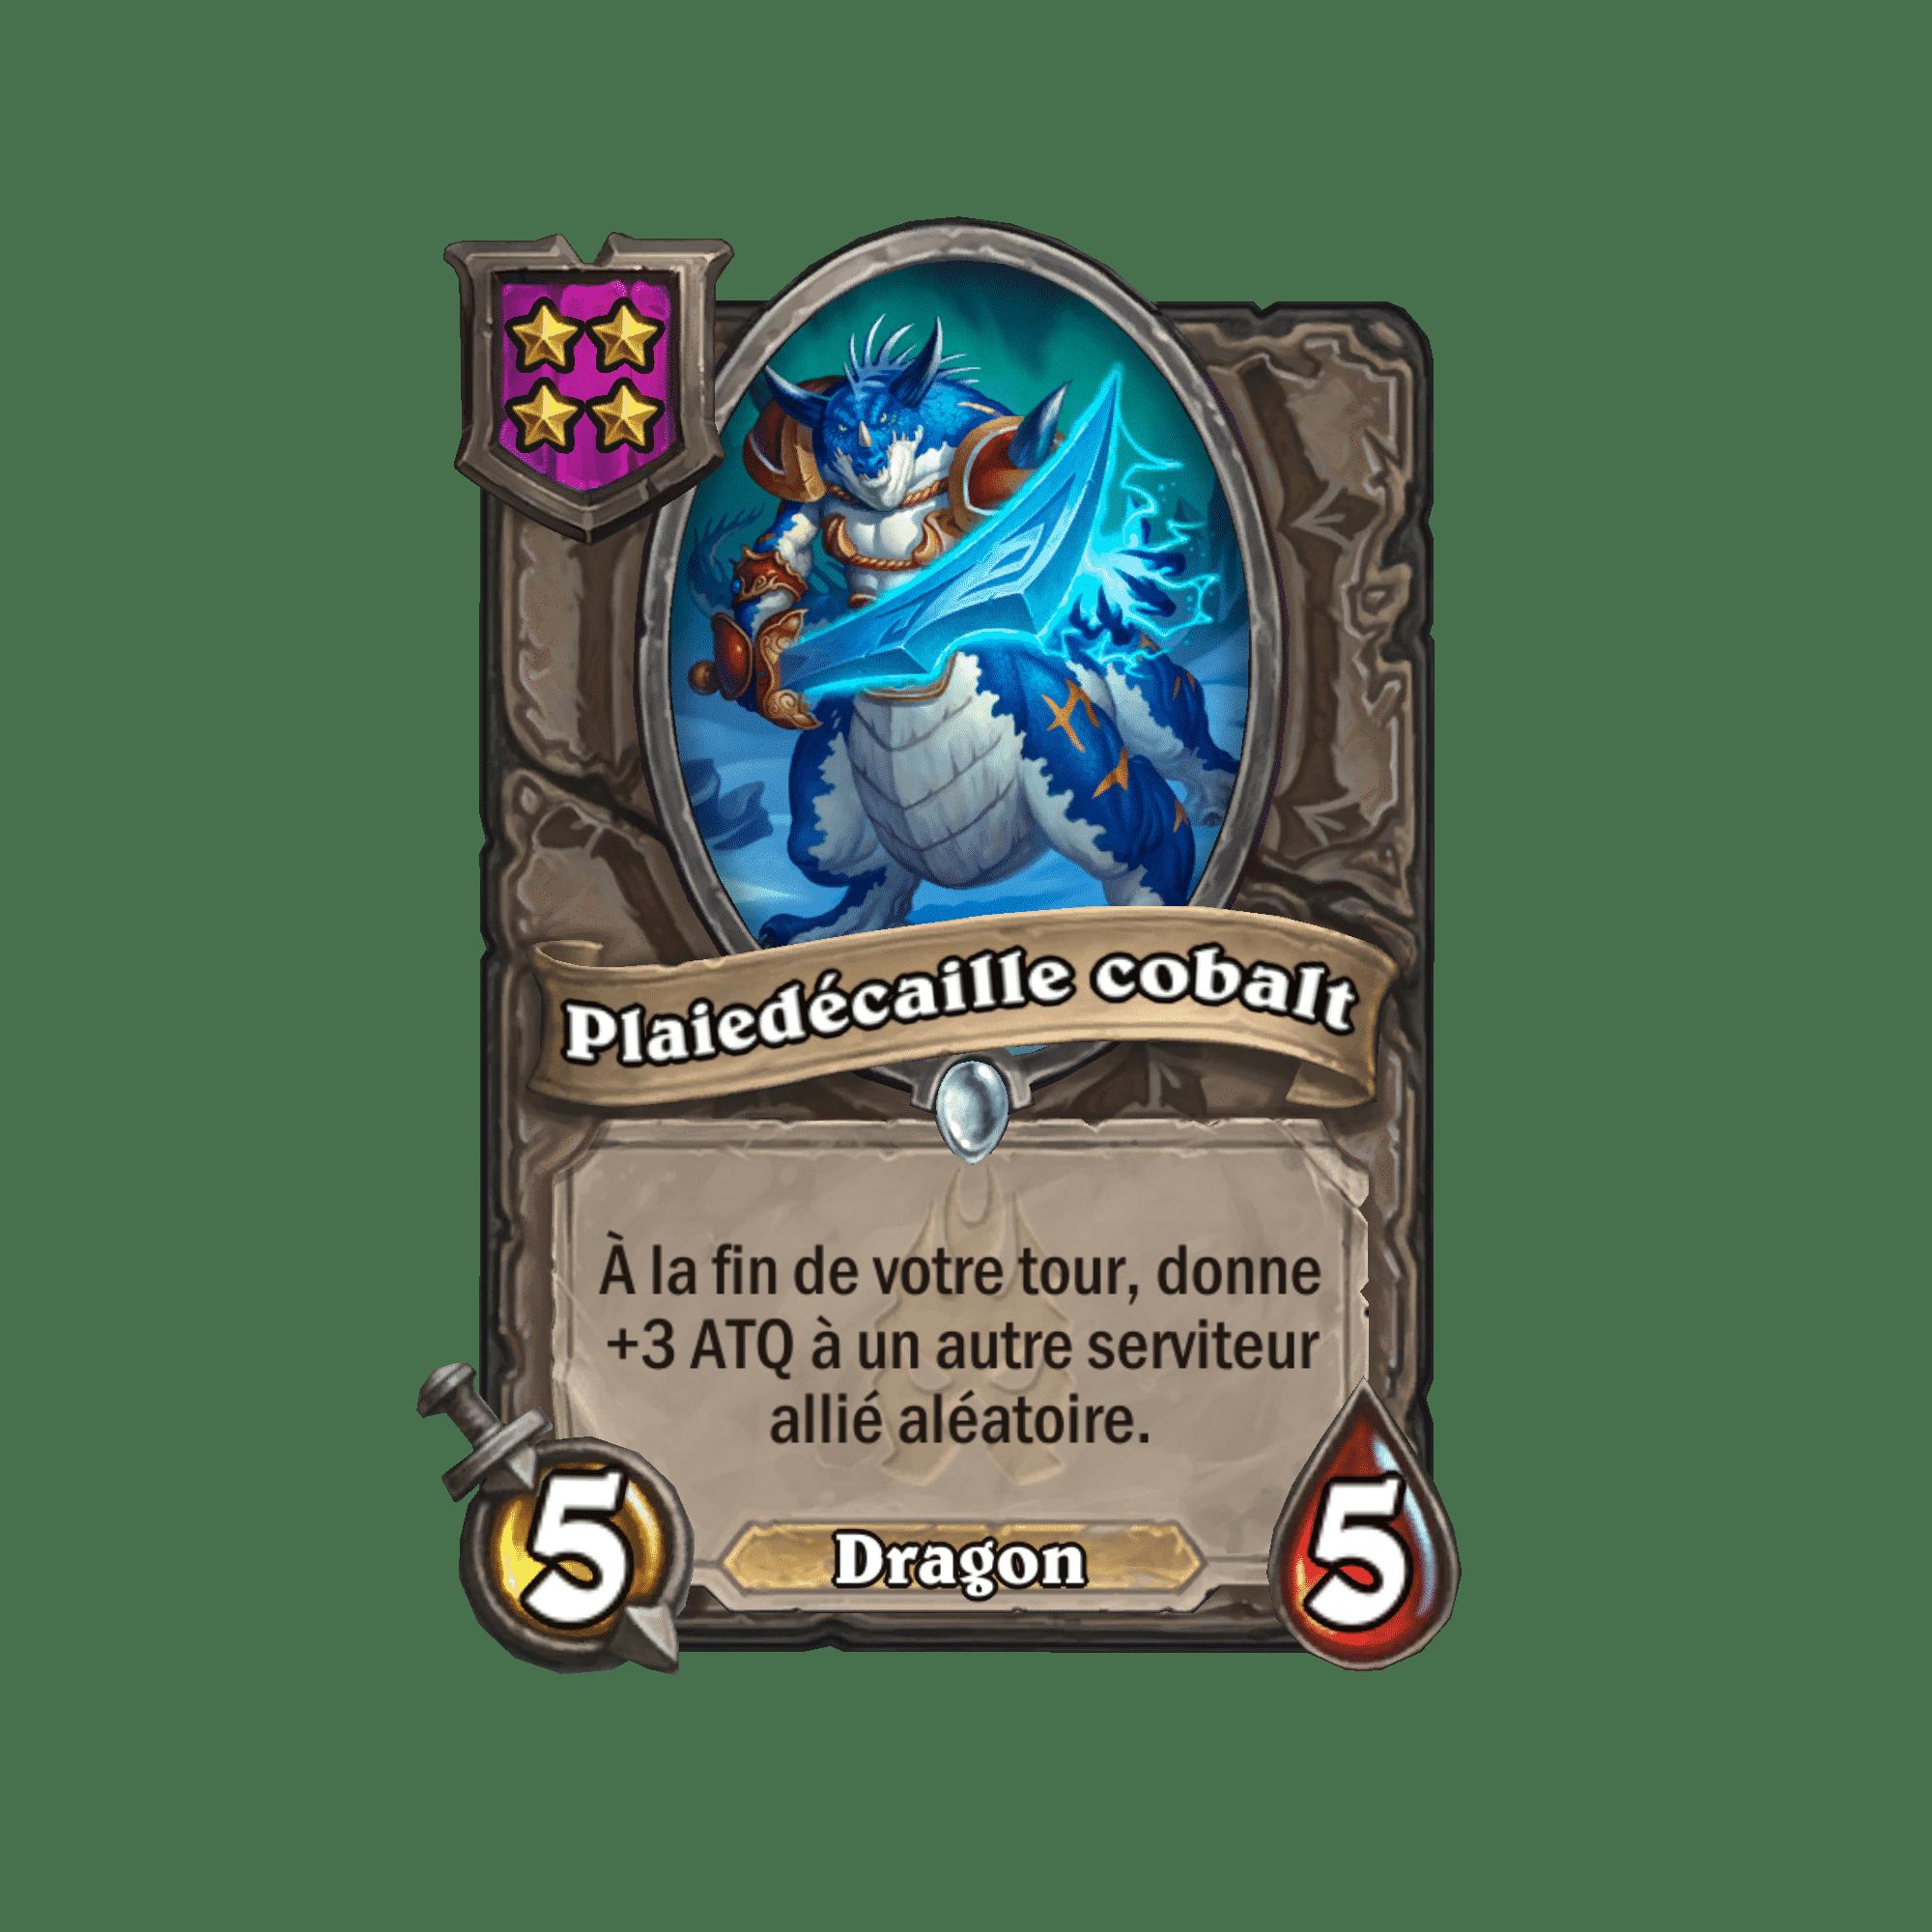 plaiedecaille-cobalt